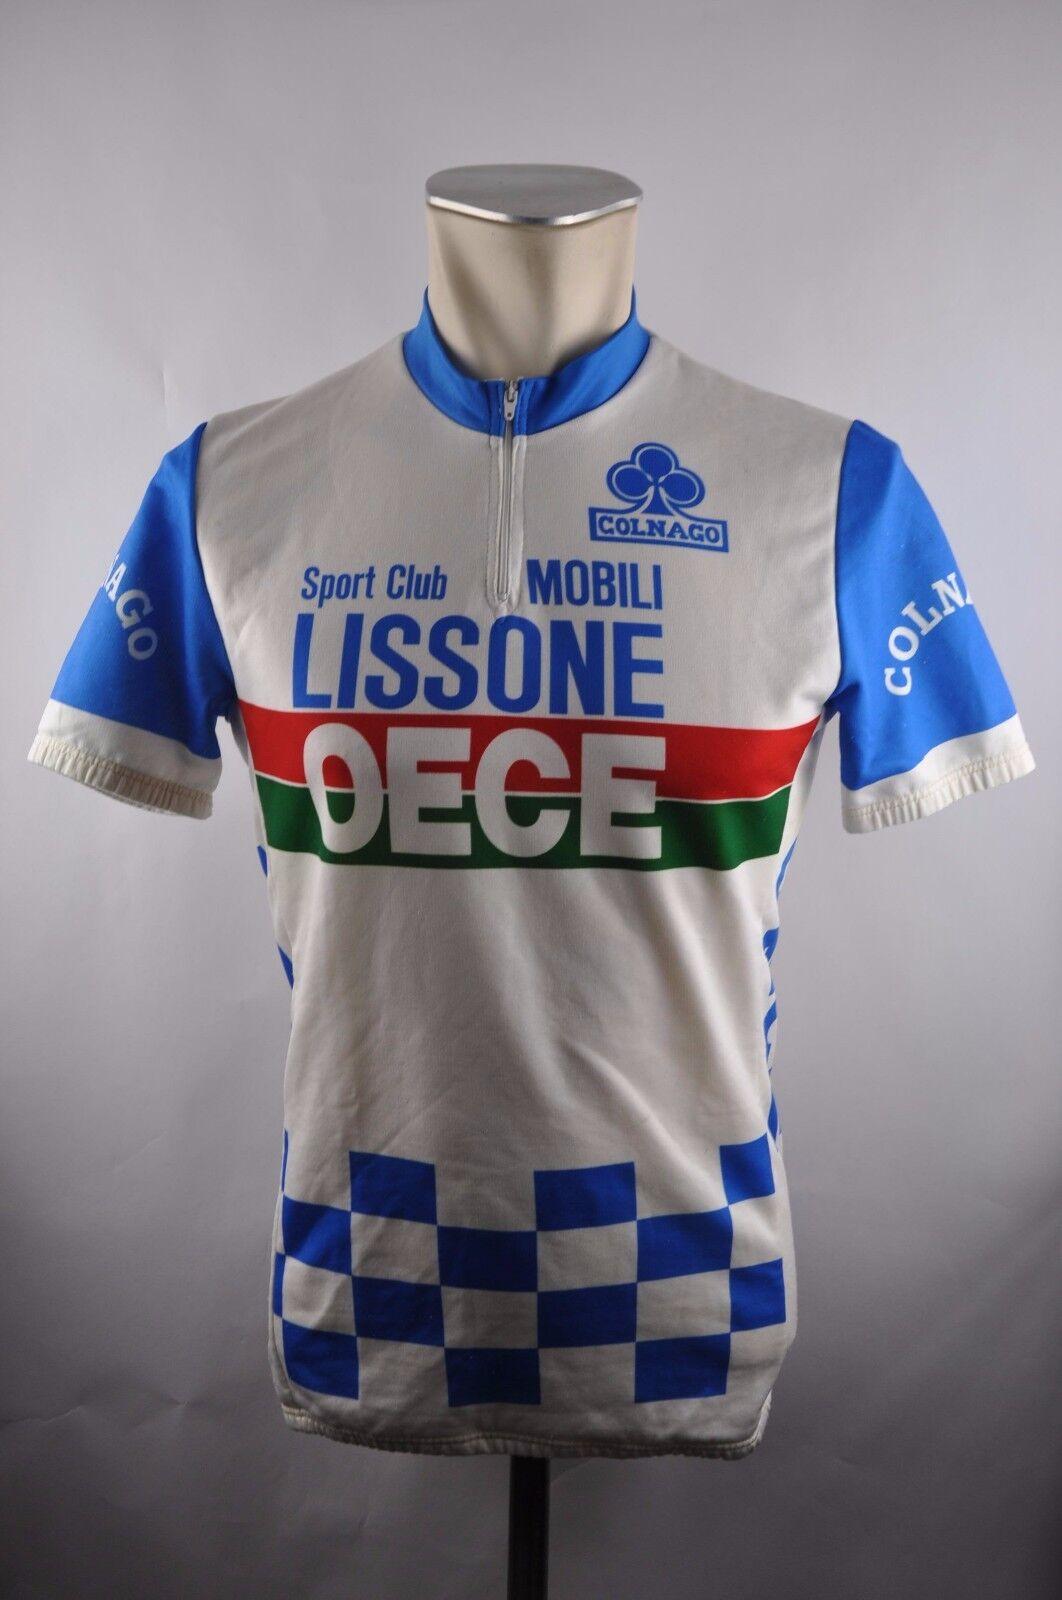 Mobili Lissone Oece vintage cycling jersey Bike Rad Trikot Gr. M 51cm U5